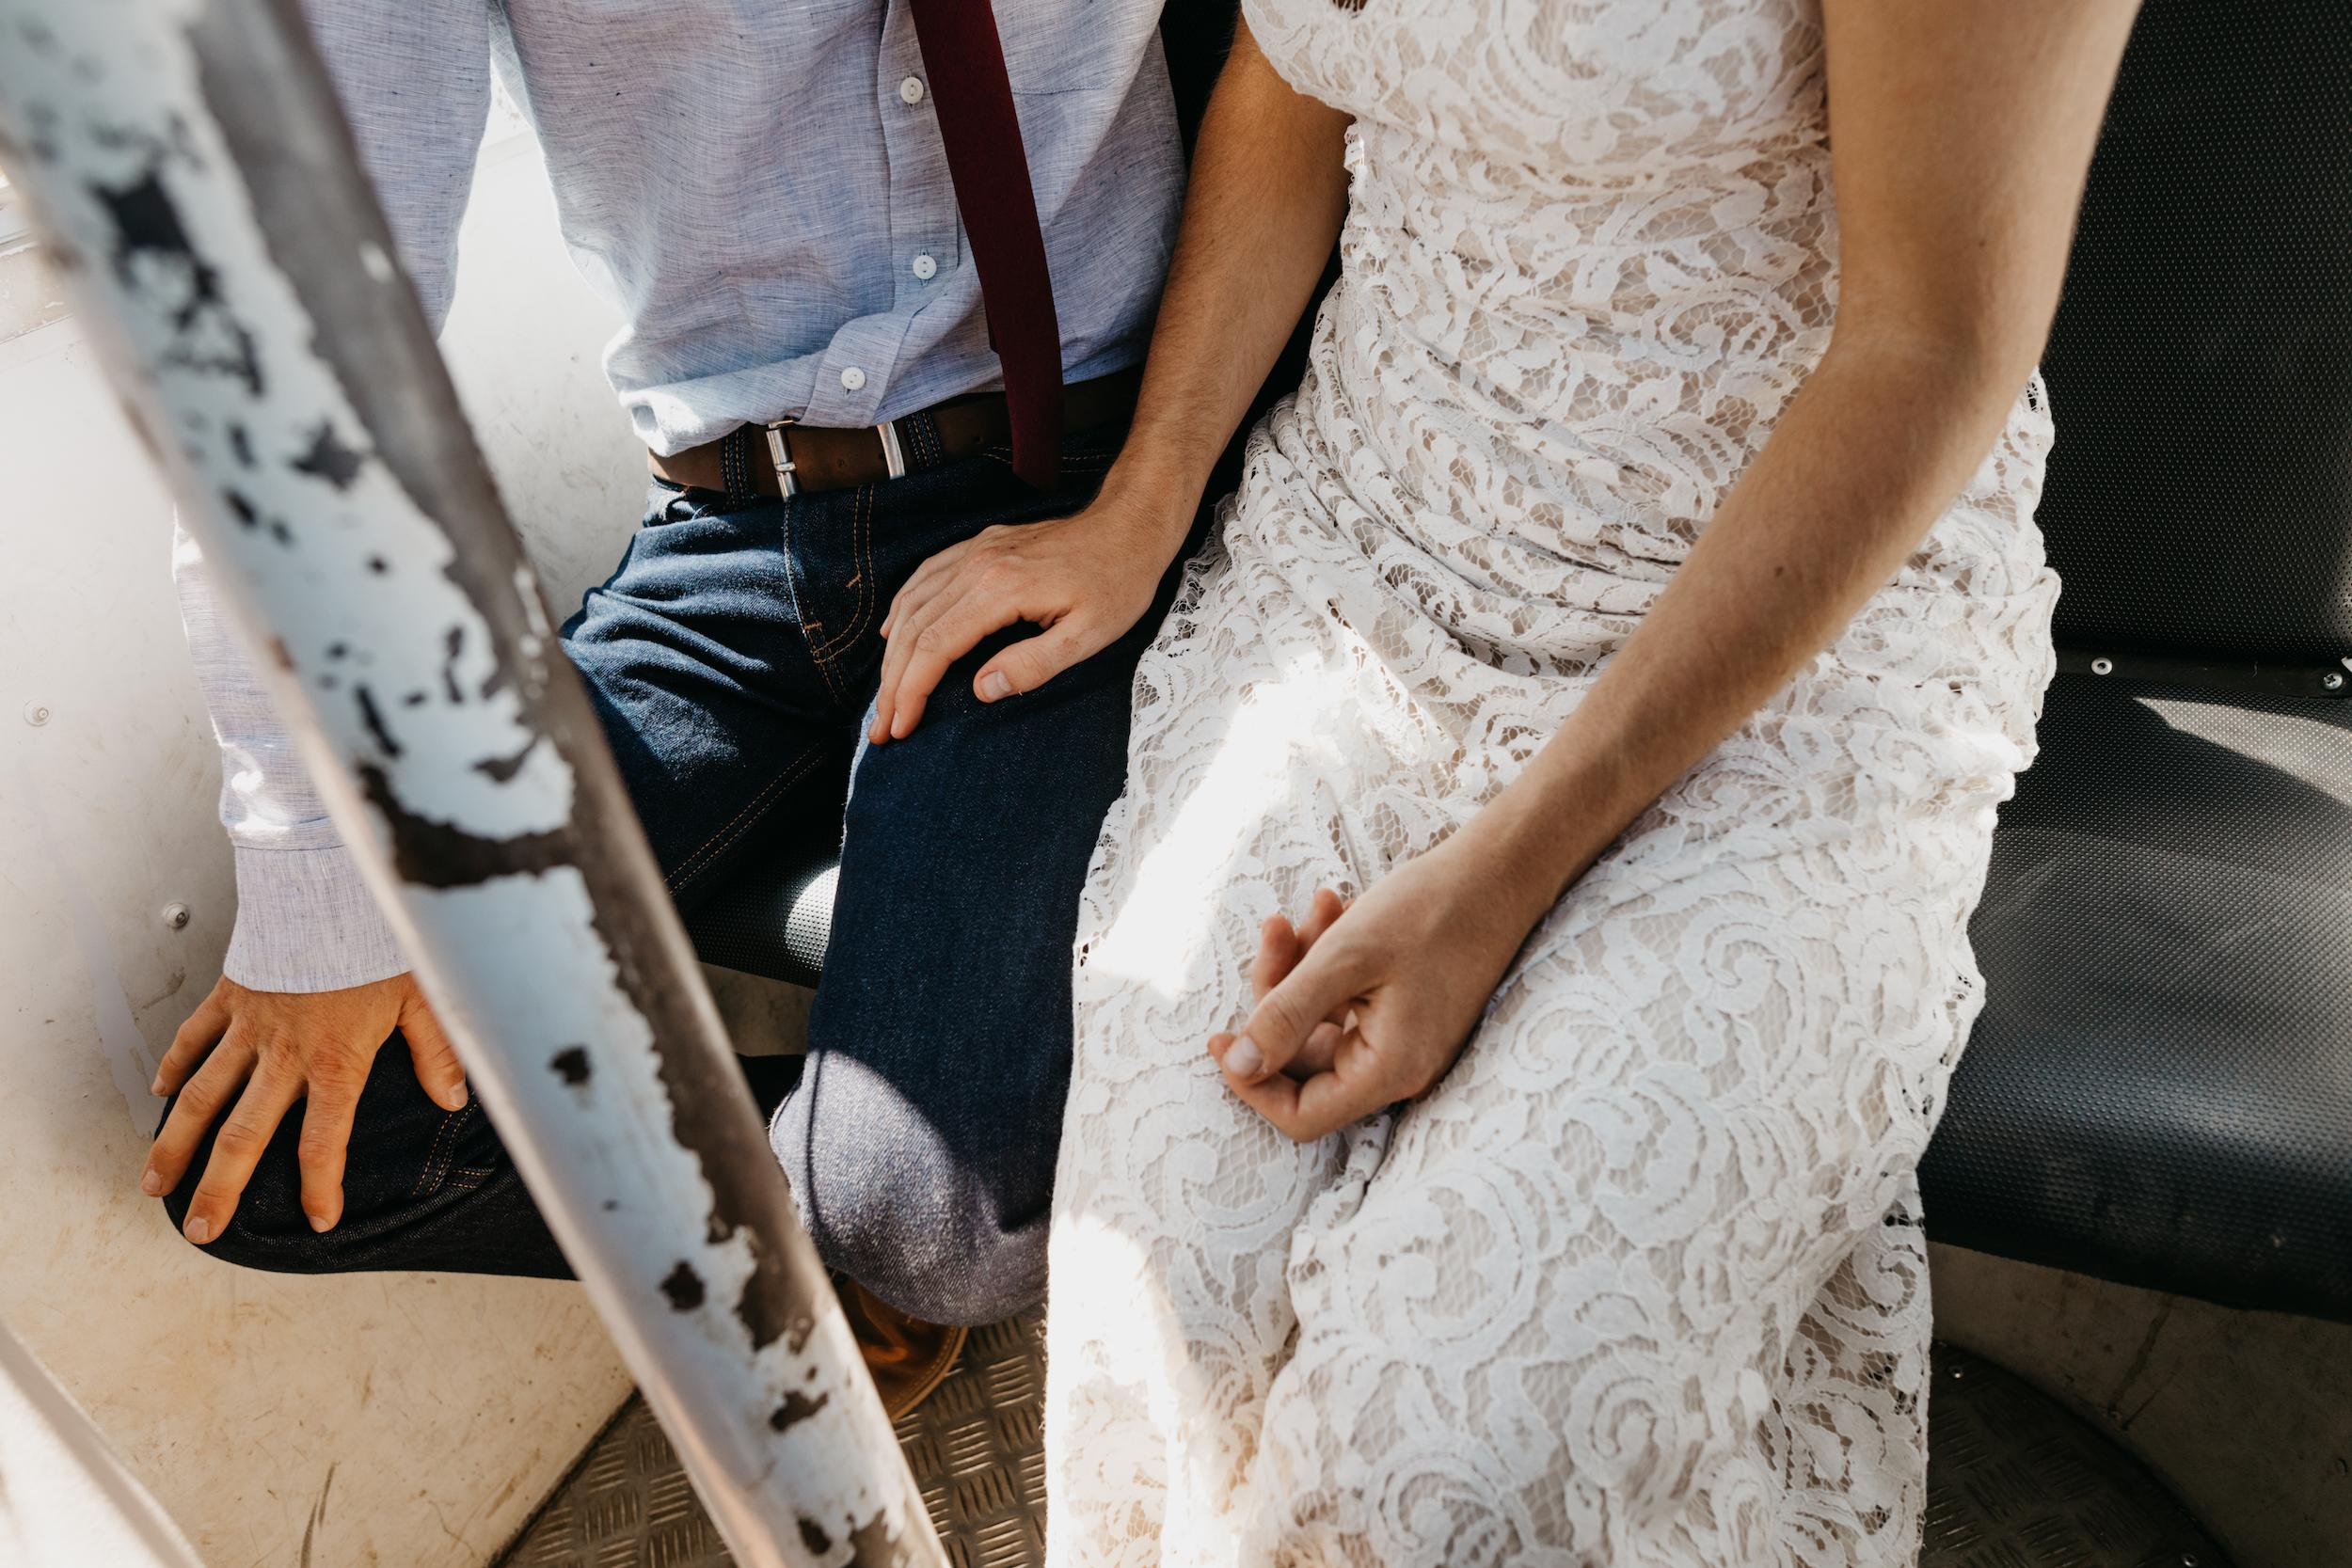 wallowa-mountains-wedding- photographer269.jpg